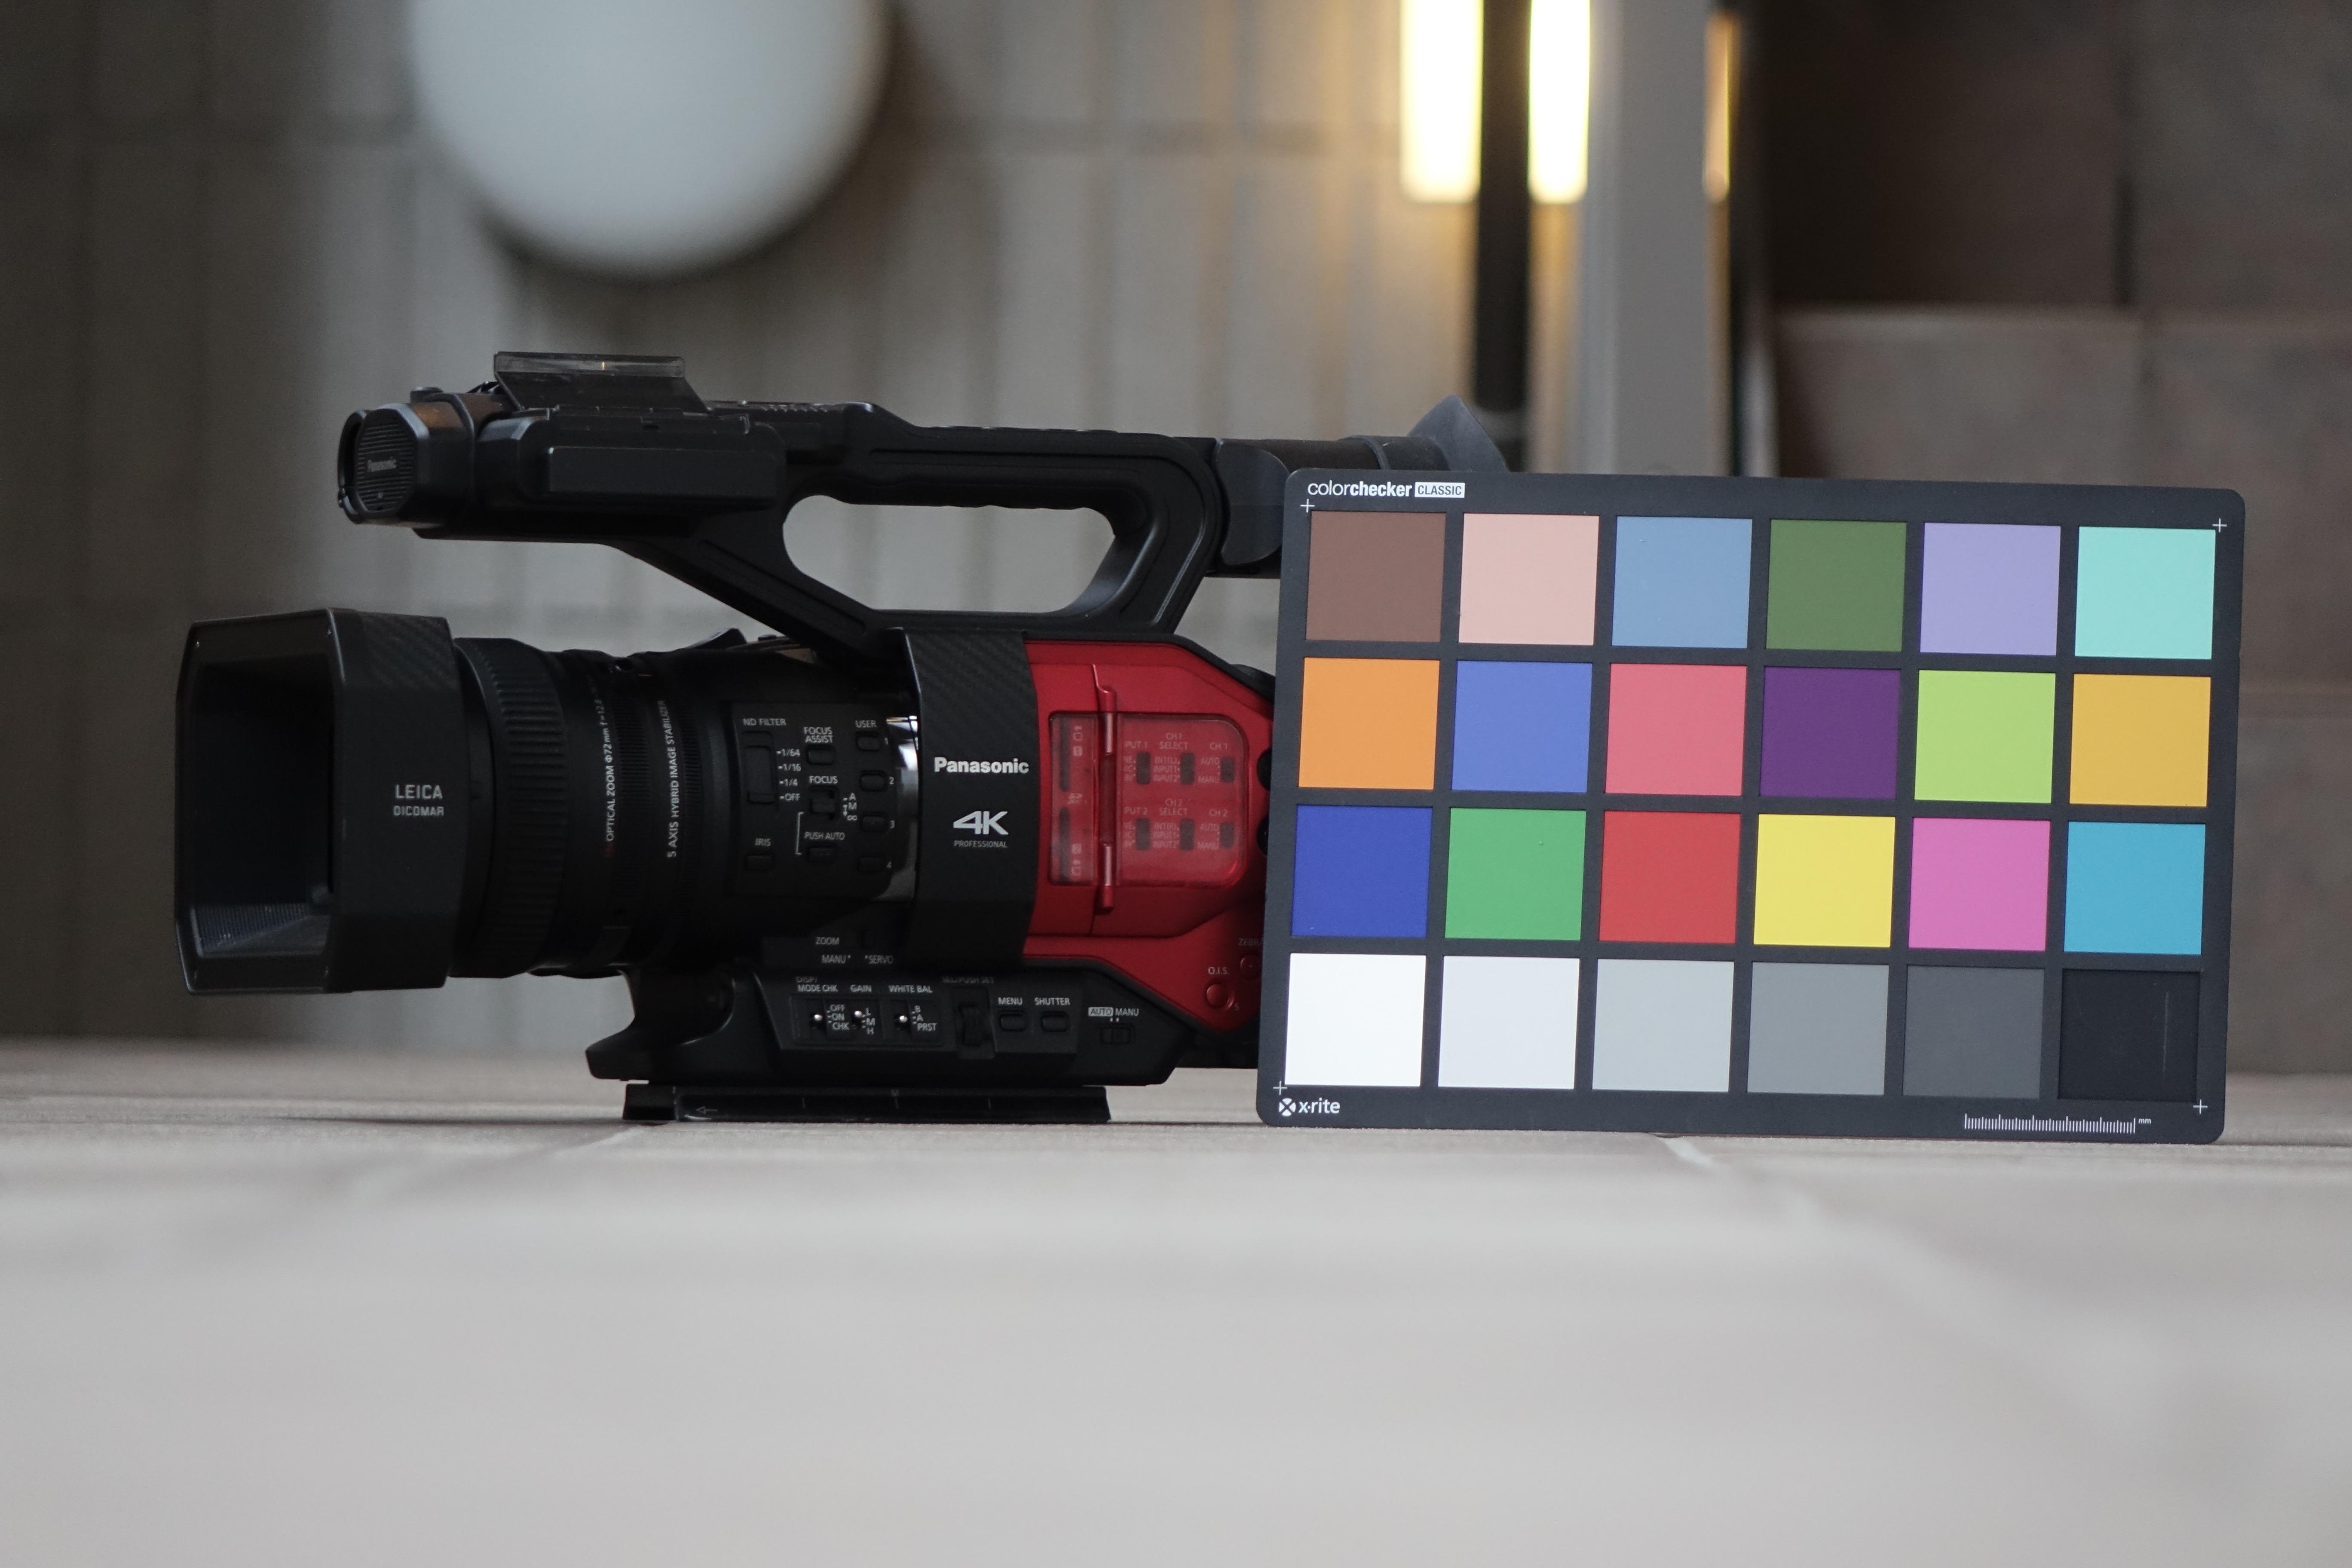 Panasonic DVX 200 Review Part 2- V-Log L, Scene Profiles and Colour